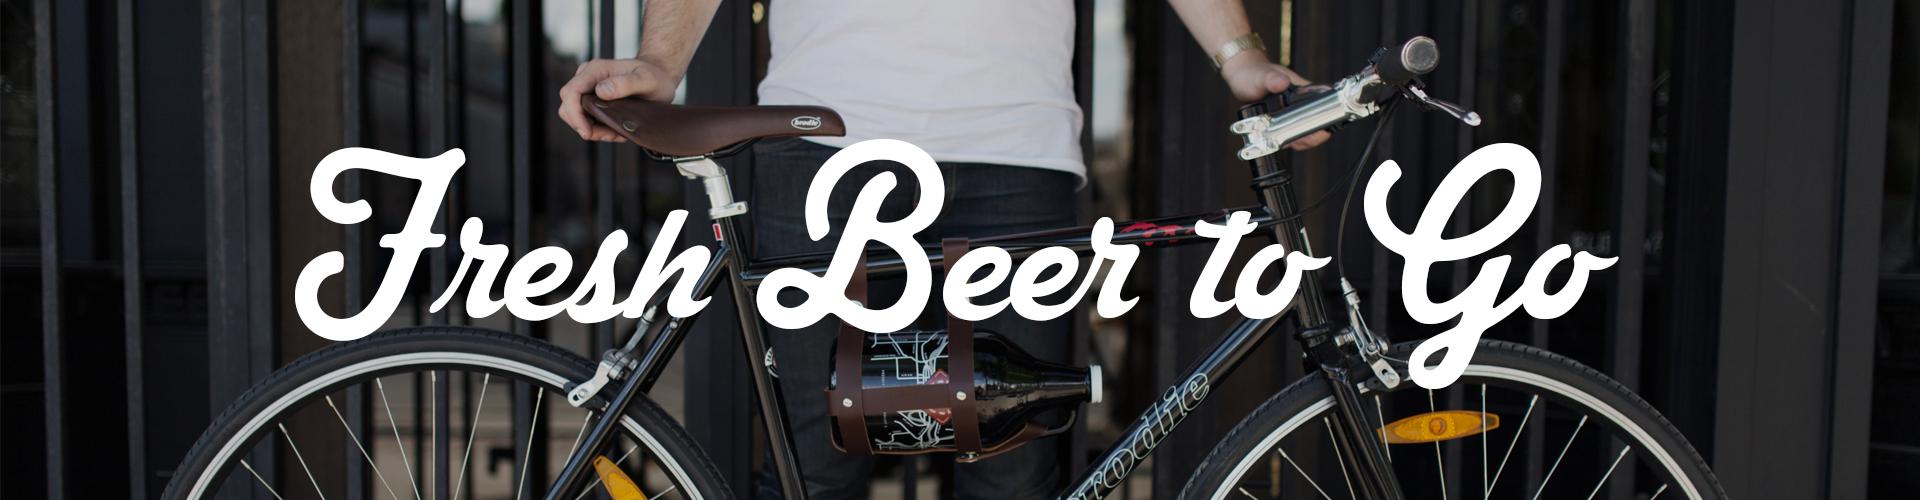 t5_bike_banner (1)